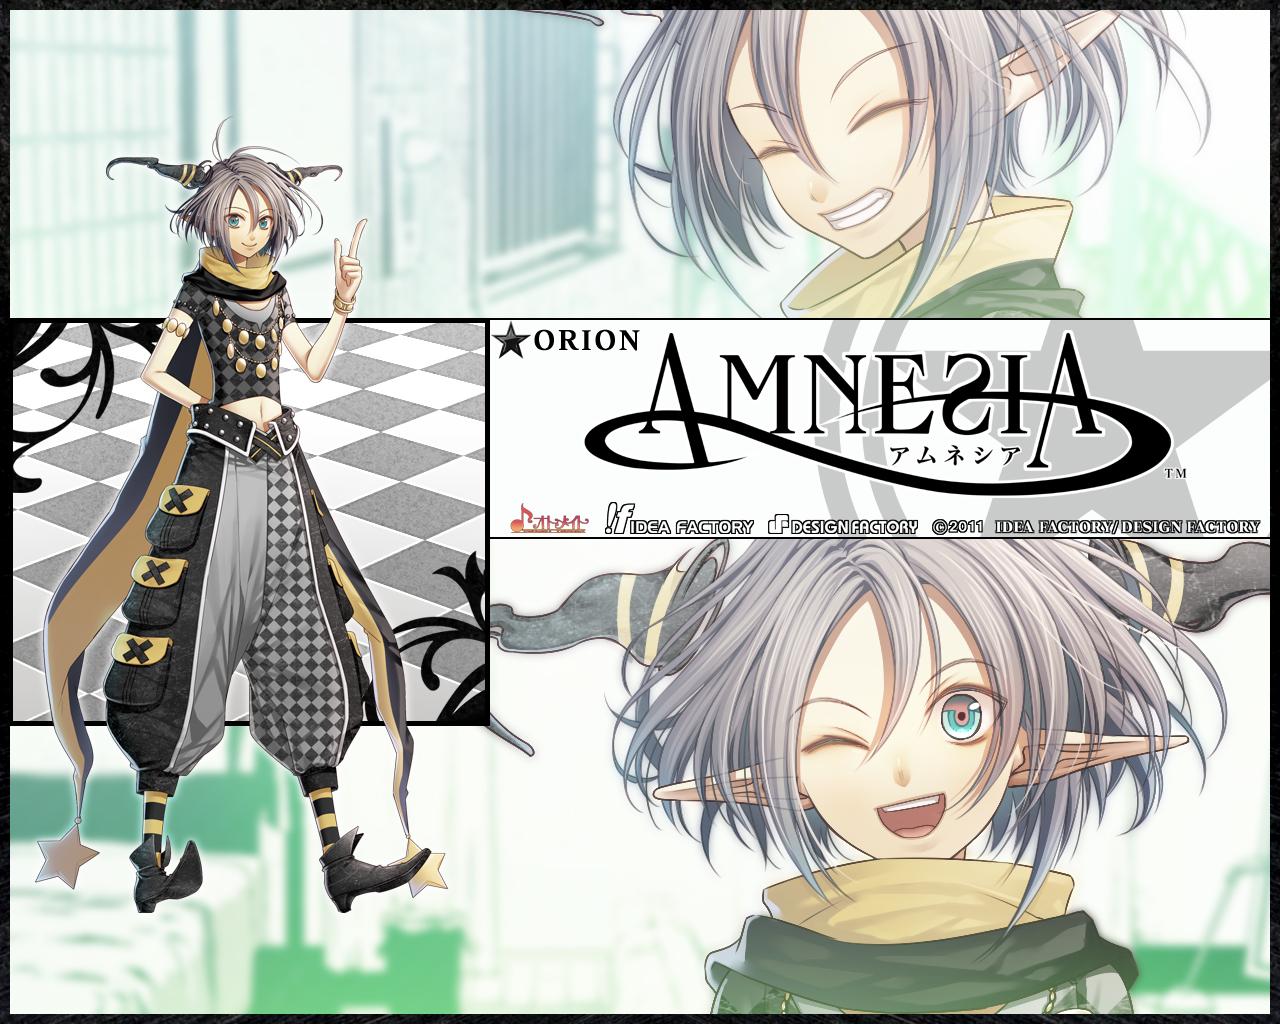 <b>AMNESIA</b>, Wallpaper | page 3 - Zerochan Anime Image Board